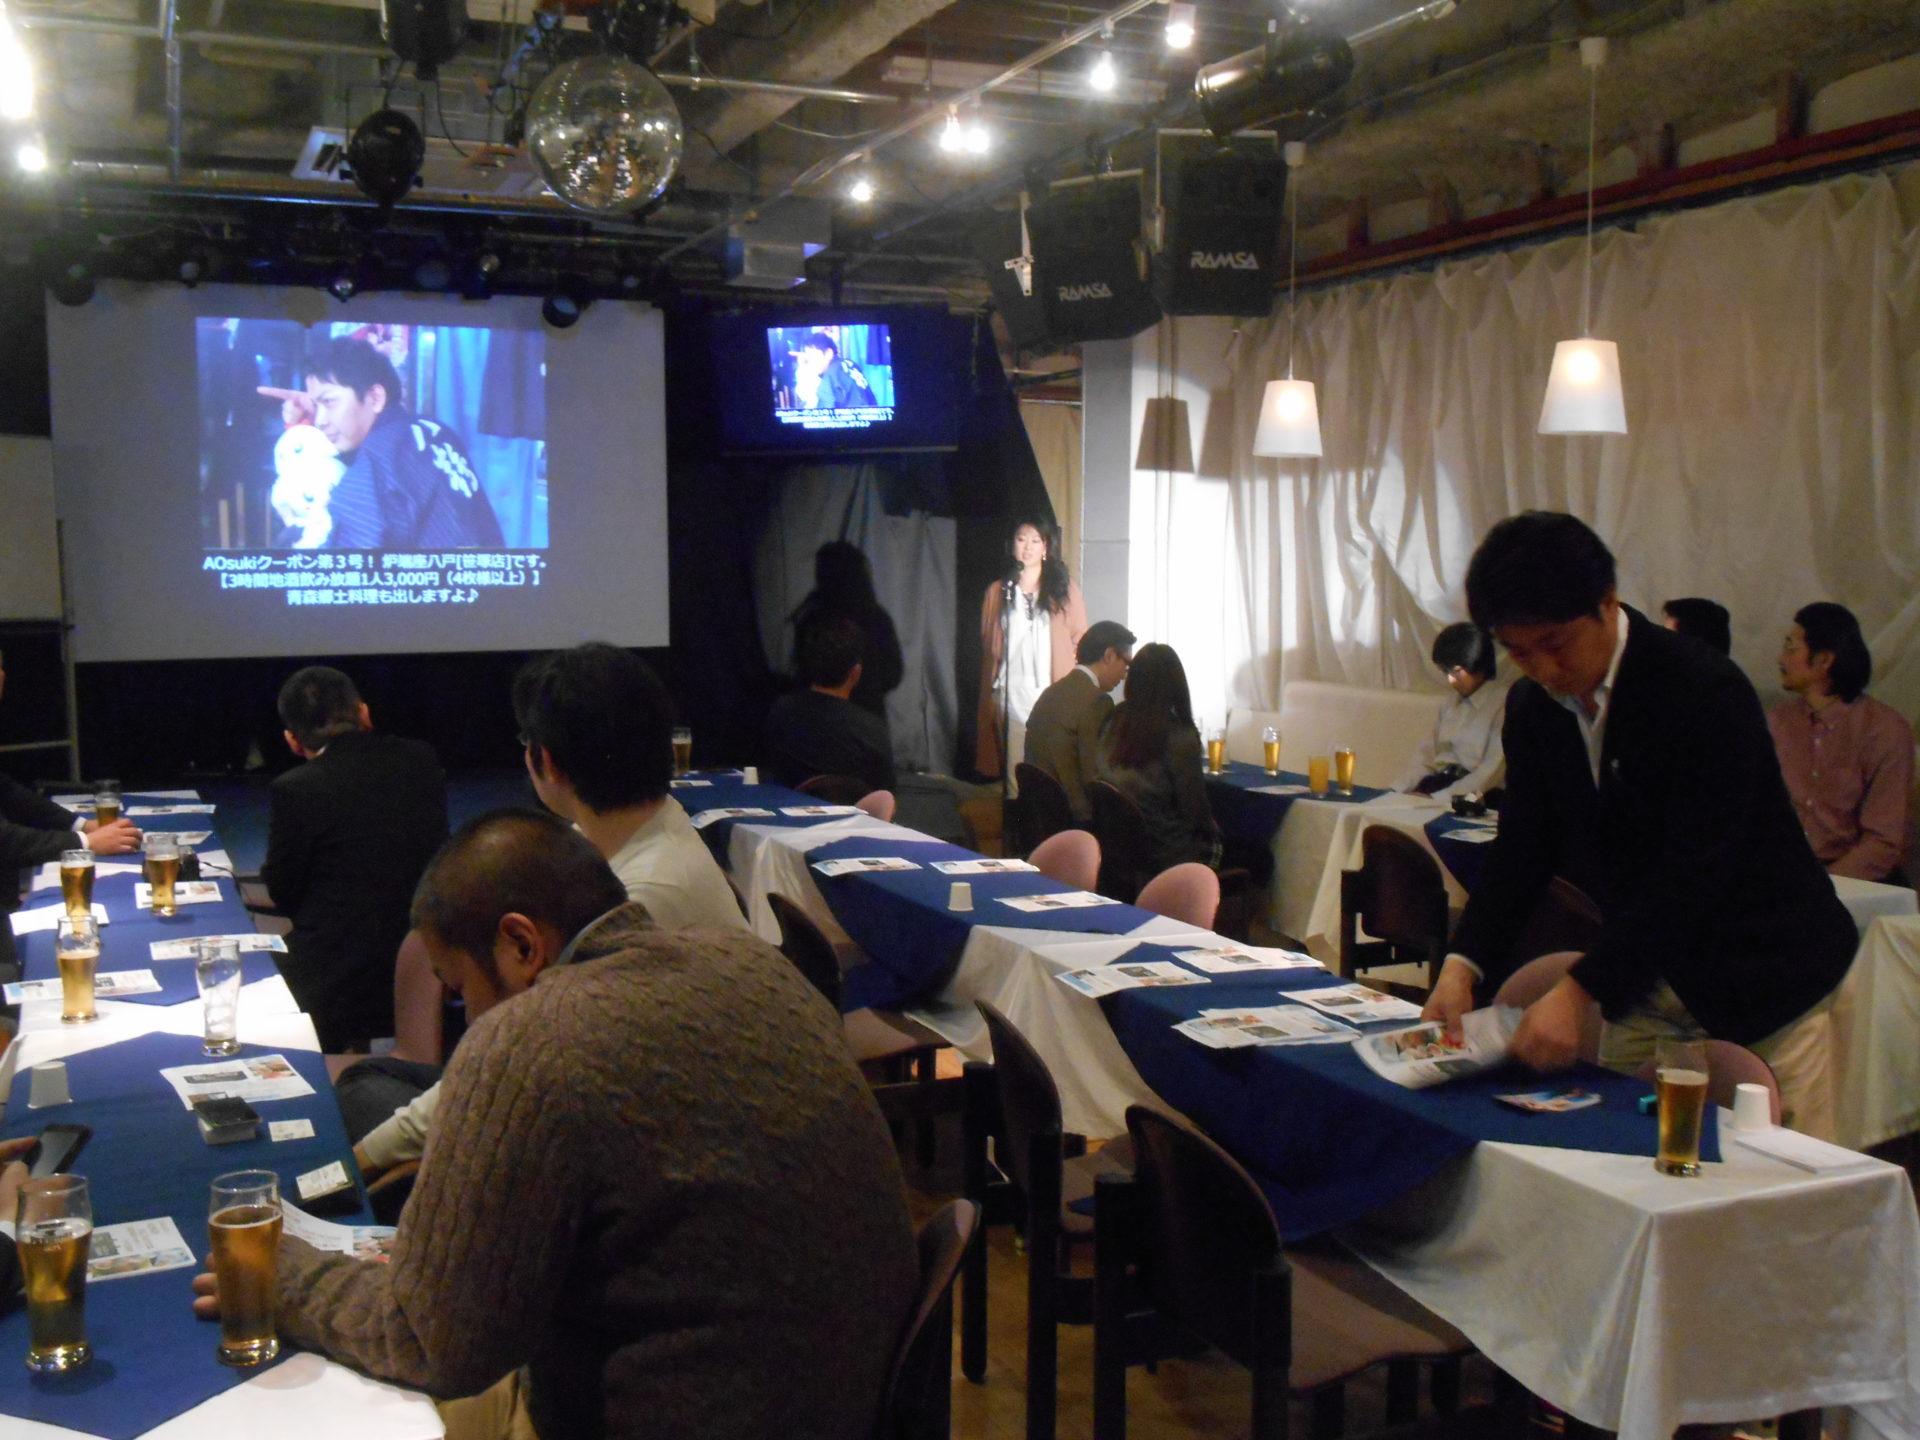 DSCN1022 1920x1440 - 2016年3月11日(金)AOsuki総会&パーティー開催しました。